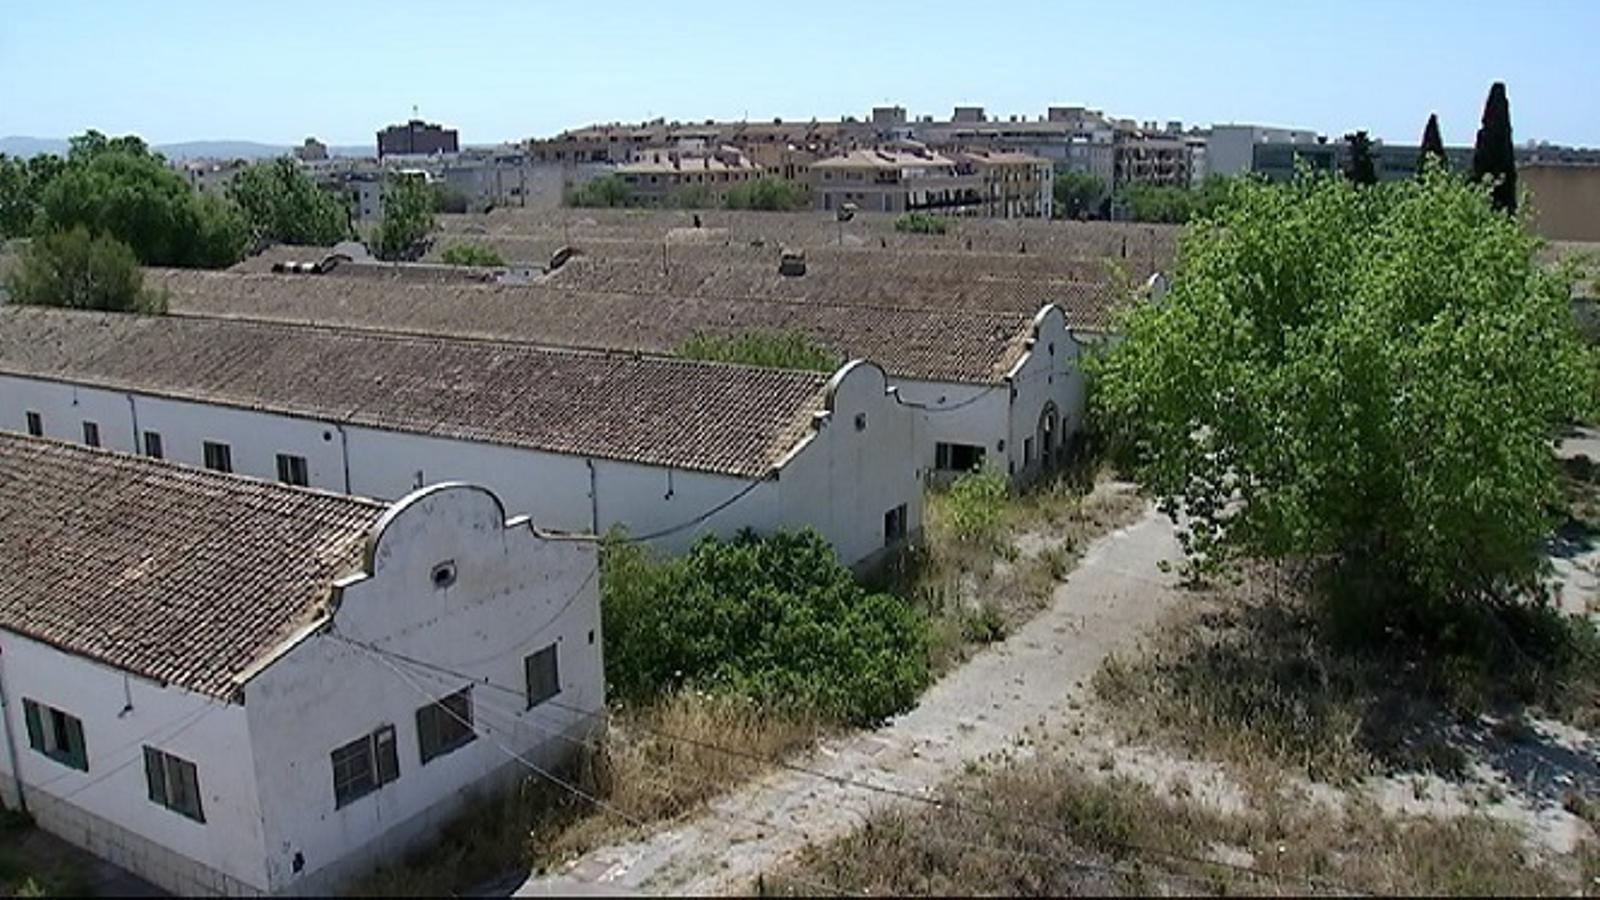 Antic quarter militar de Son Busquets, a Palma